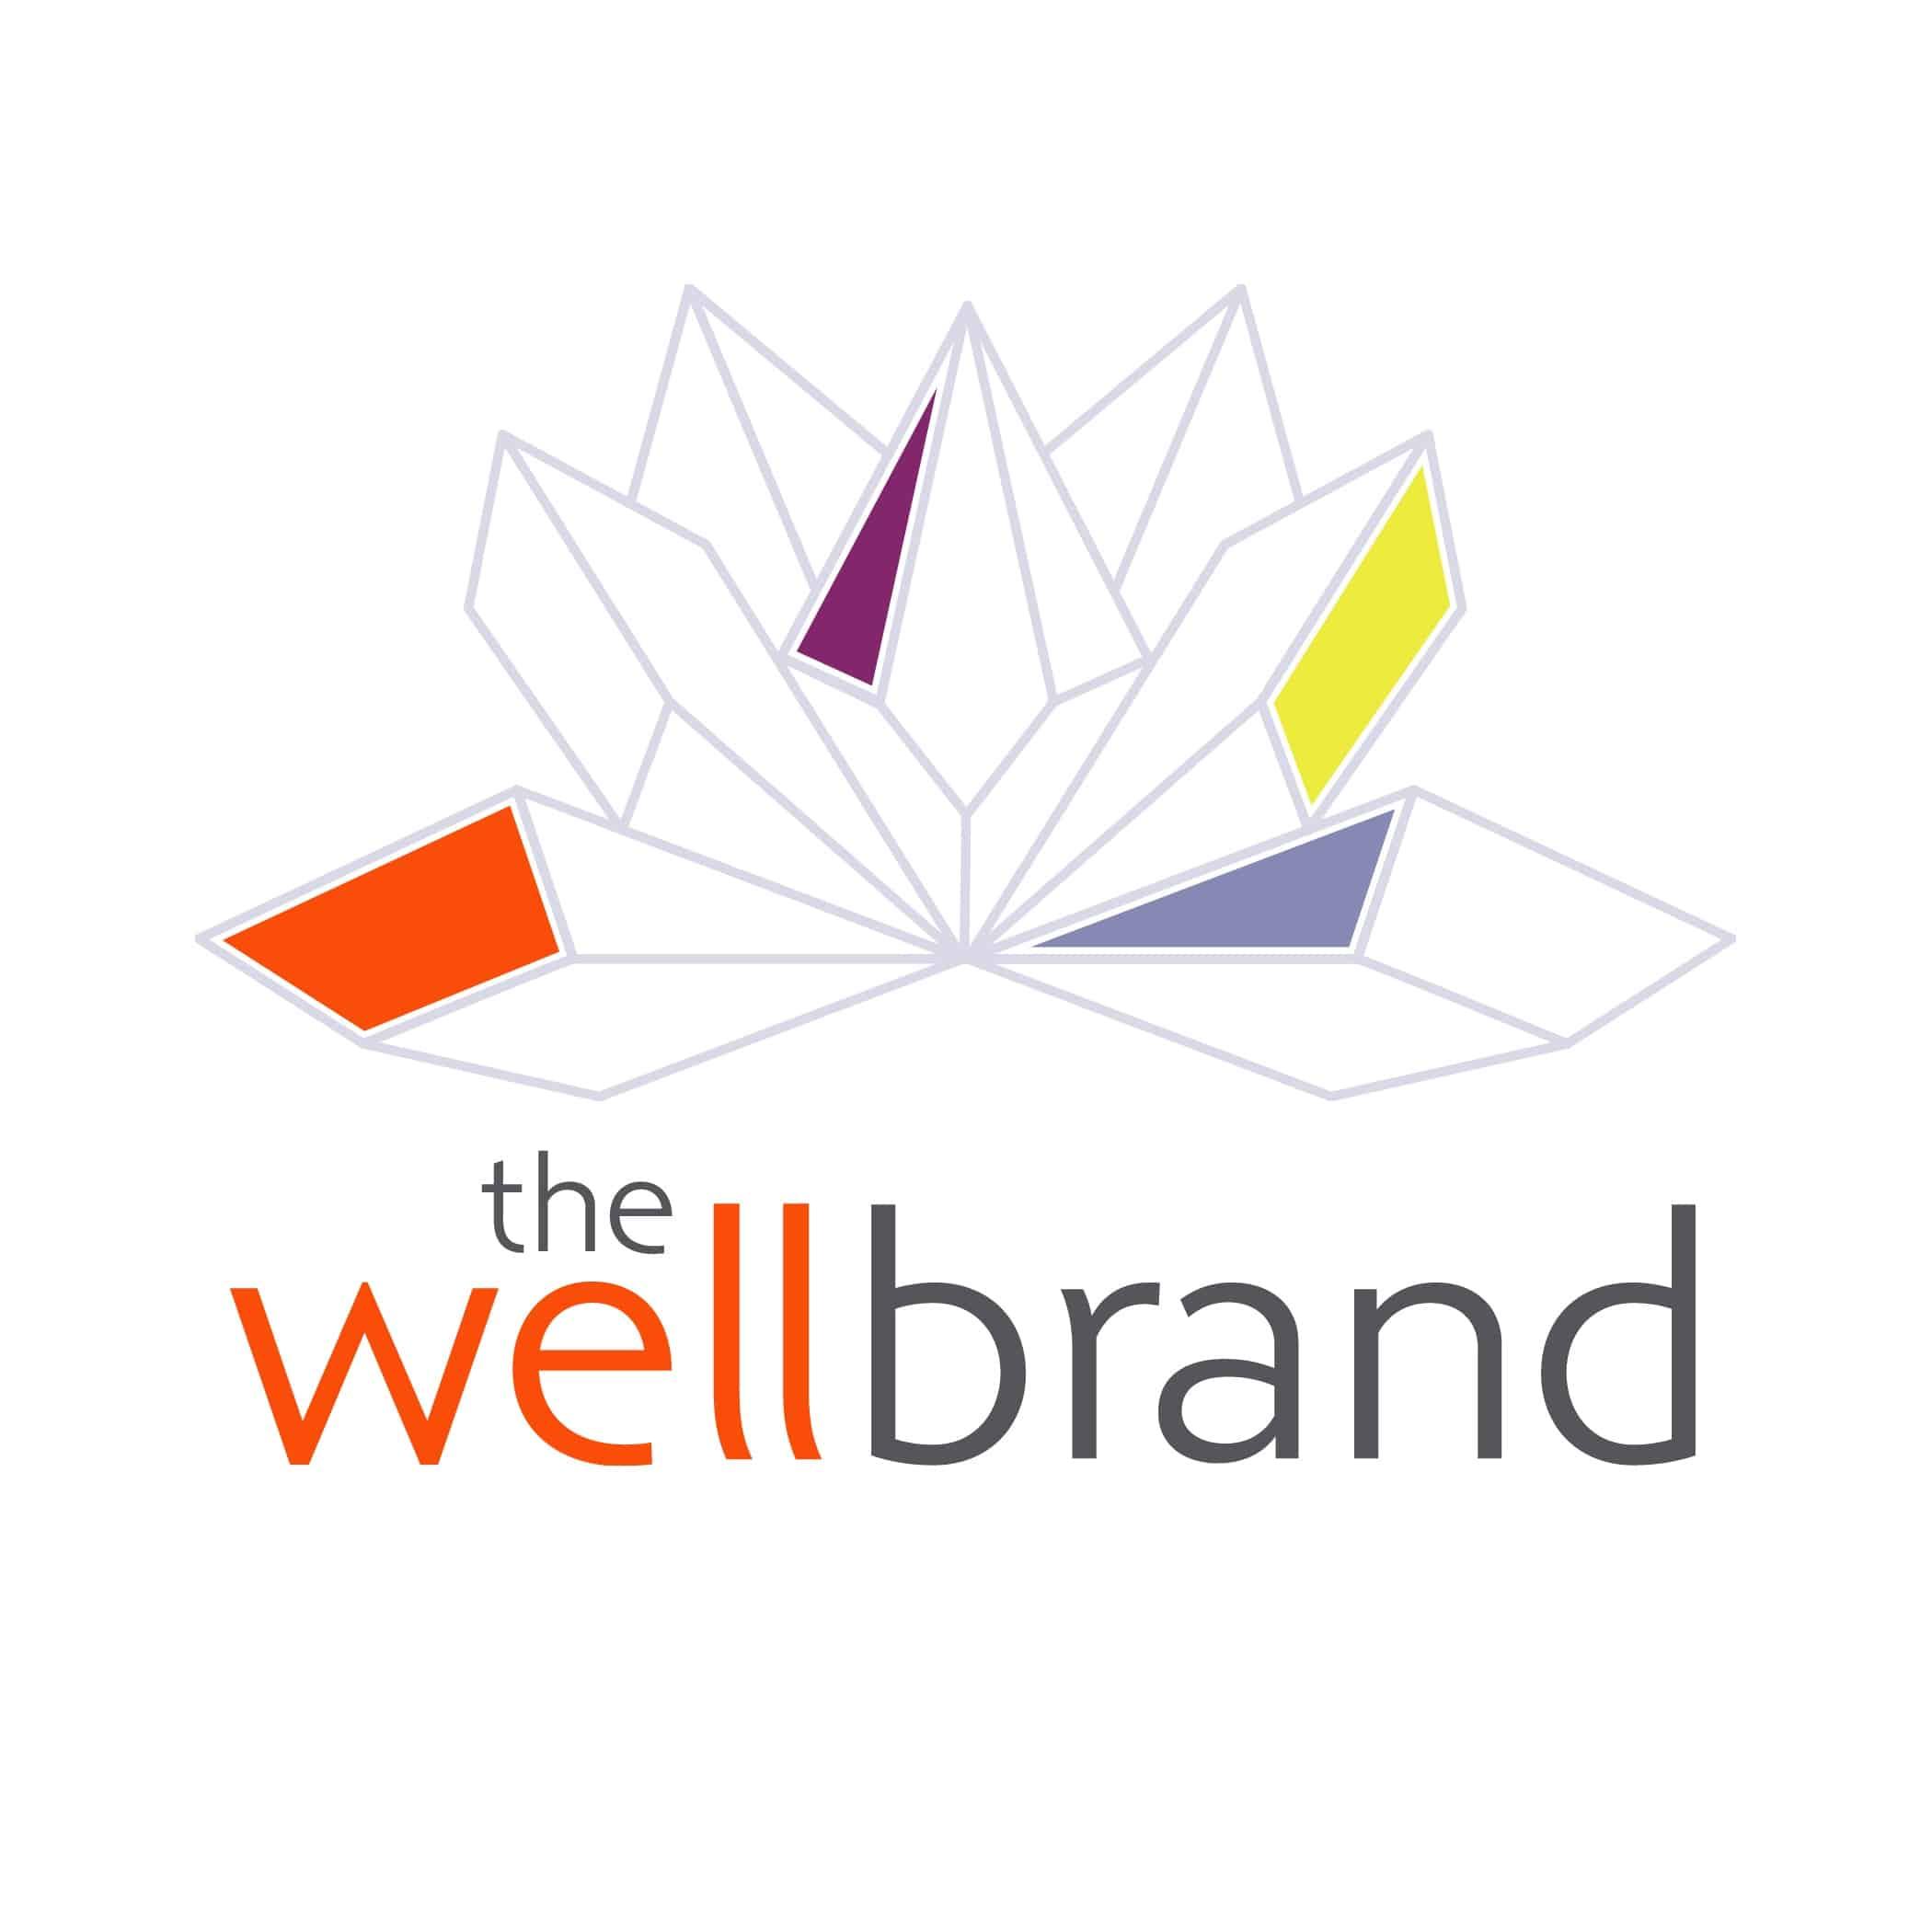 The WellBrand